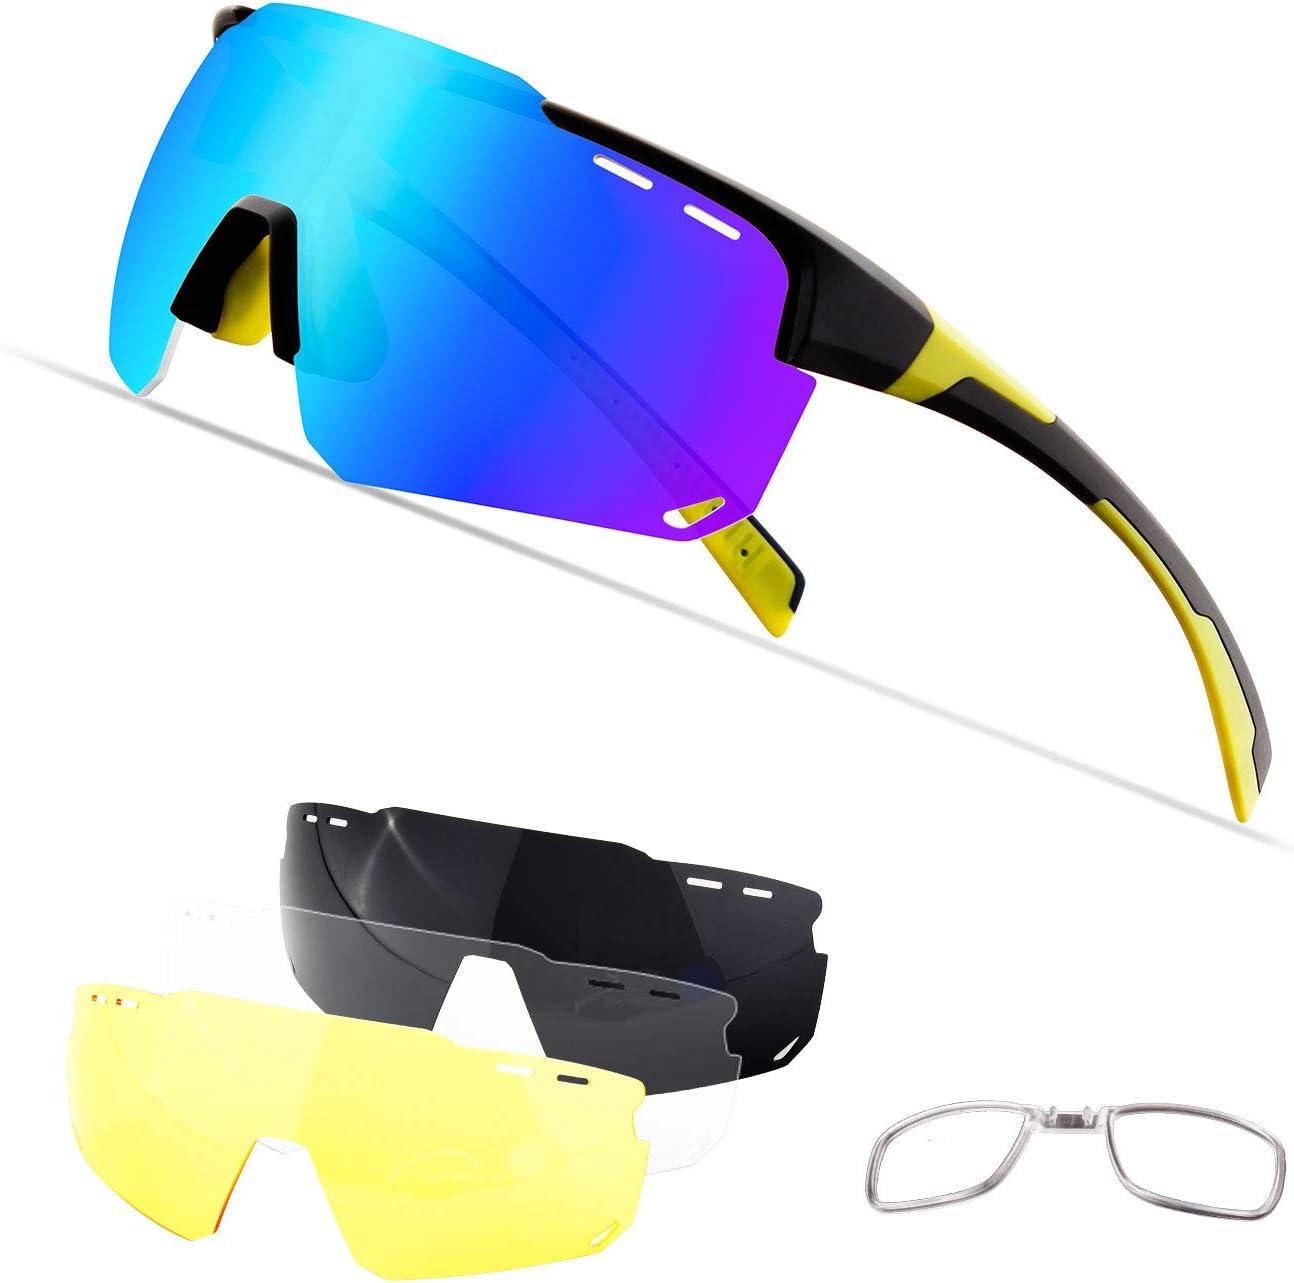 OULIQI Gafas De Sol Polarizadas para,Gafas Ciclismo,Ciclismo con 4 Lentes Intercambiables UV400 Y Montura De TR-90, Gafas para MTB Bicicleta Montaña 100% De Protección UV